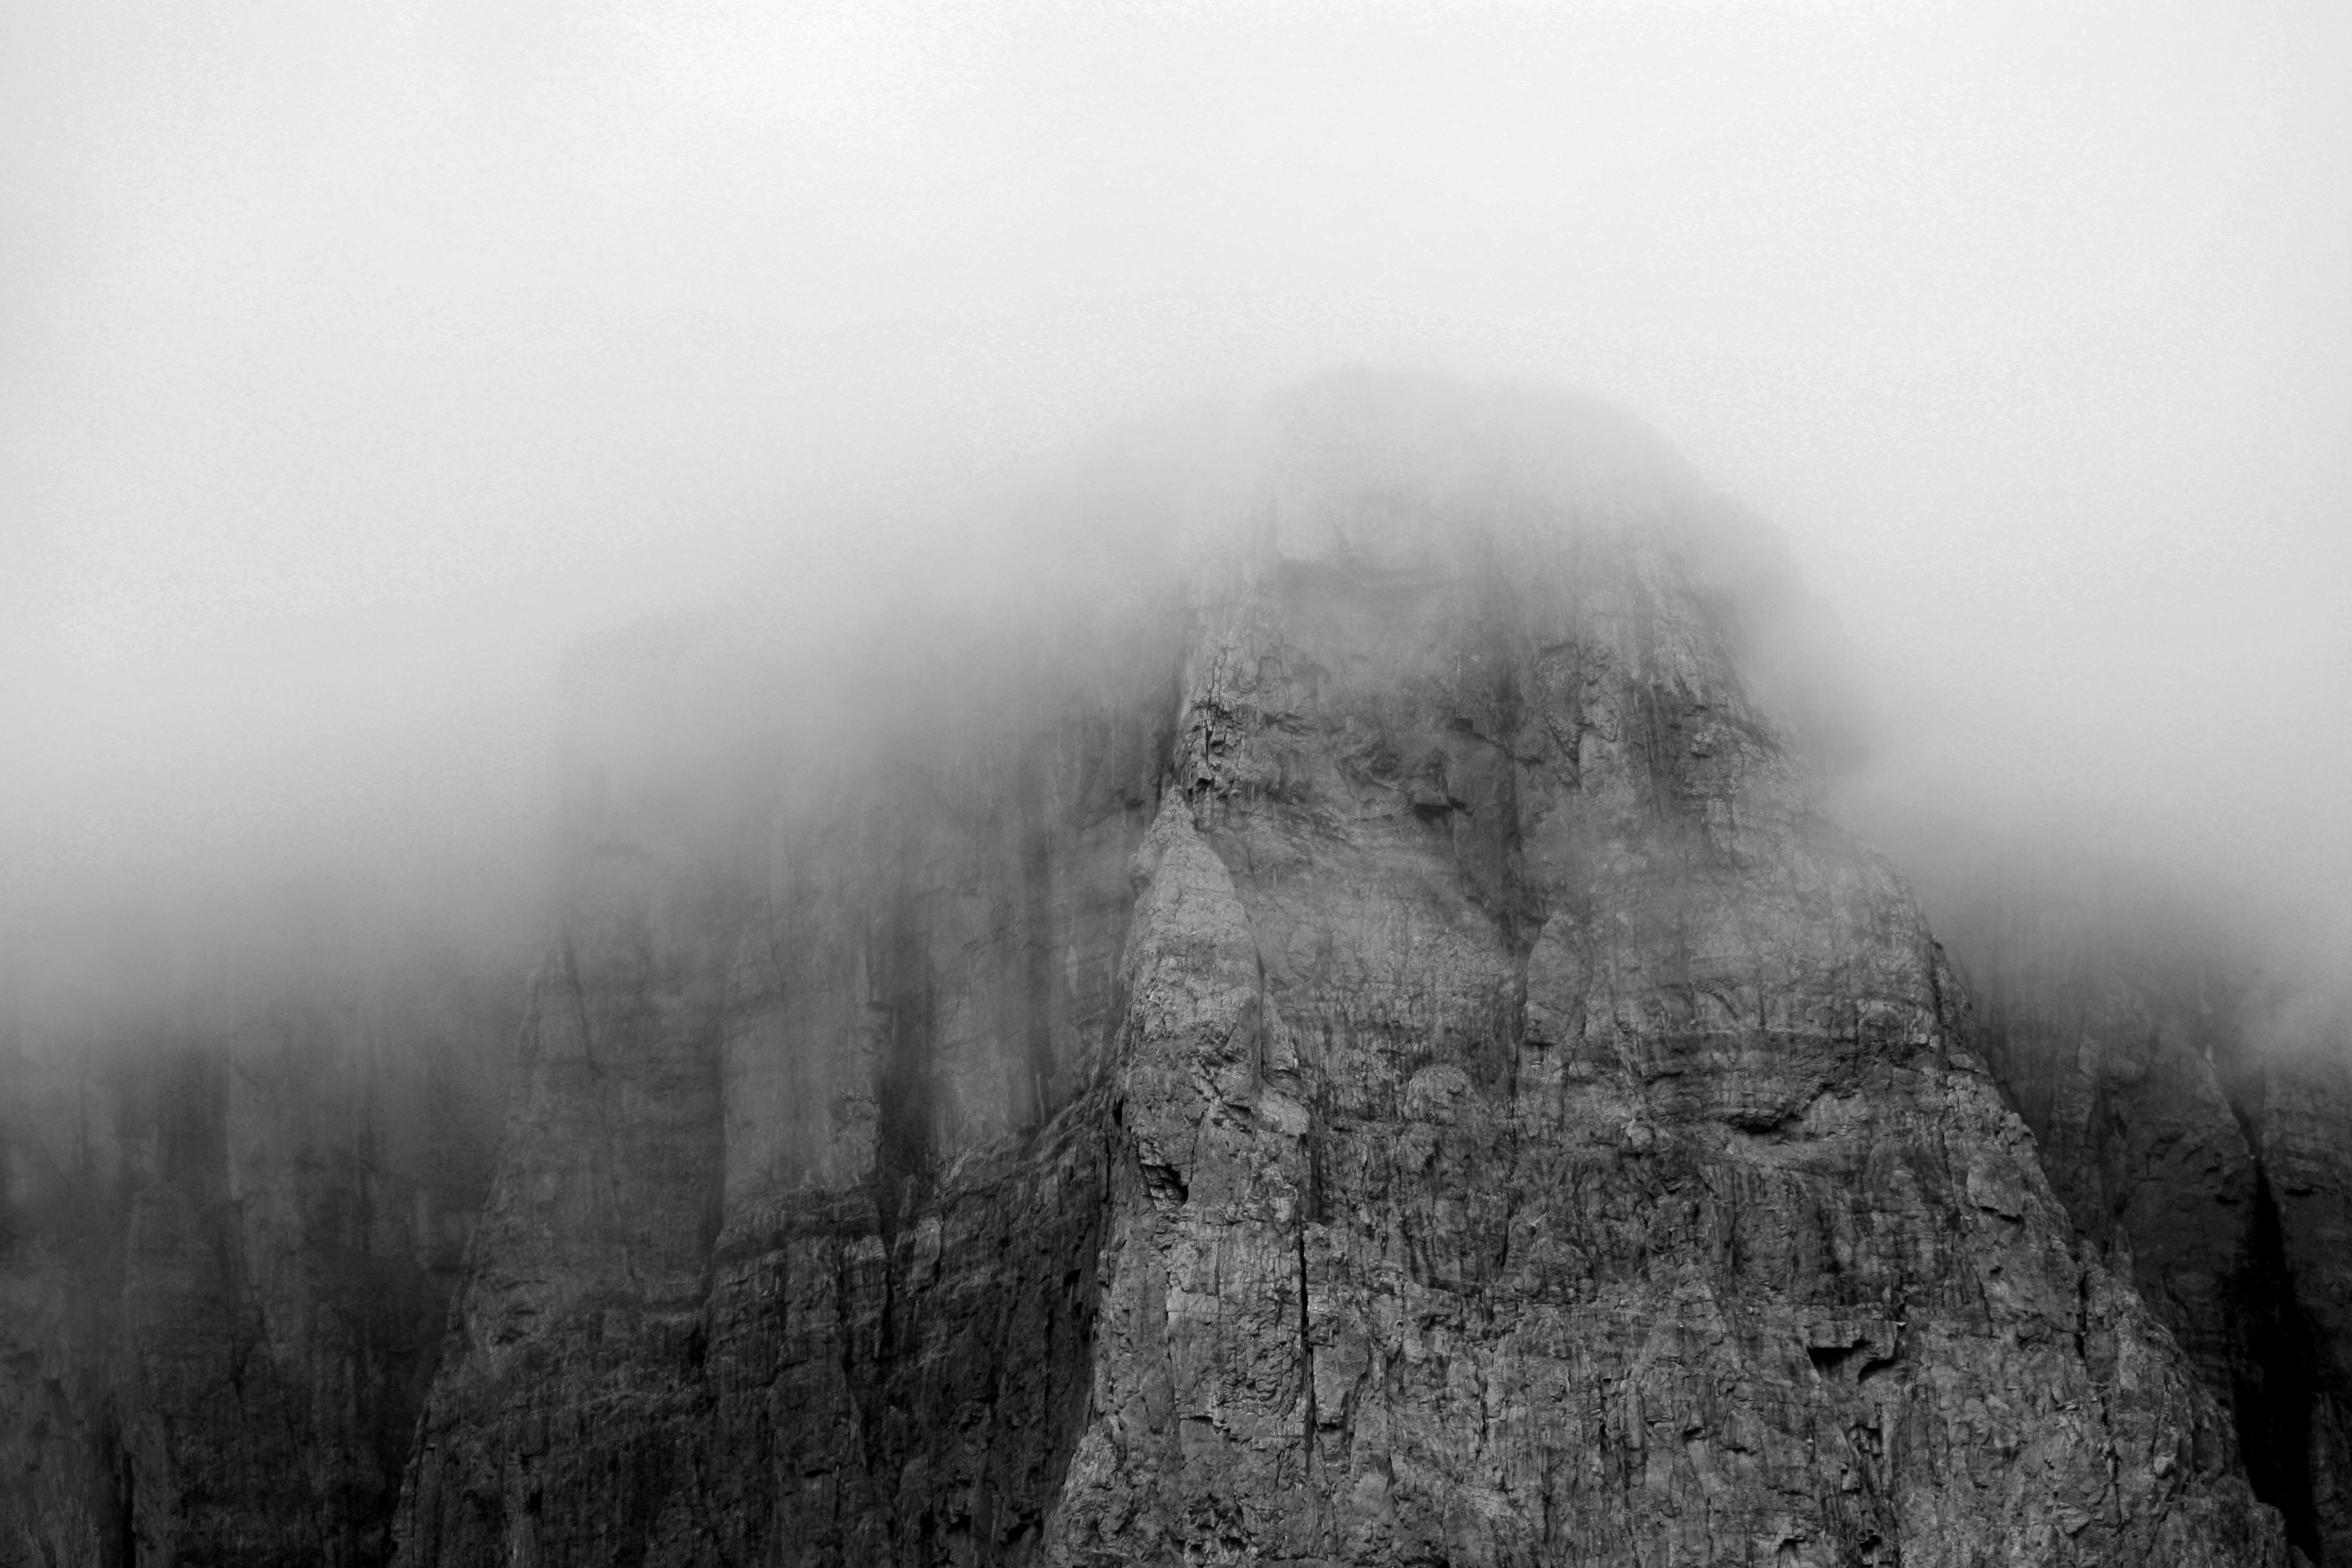 Gray rocky facade of Castle Mountain disappears into the fog